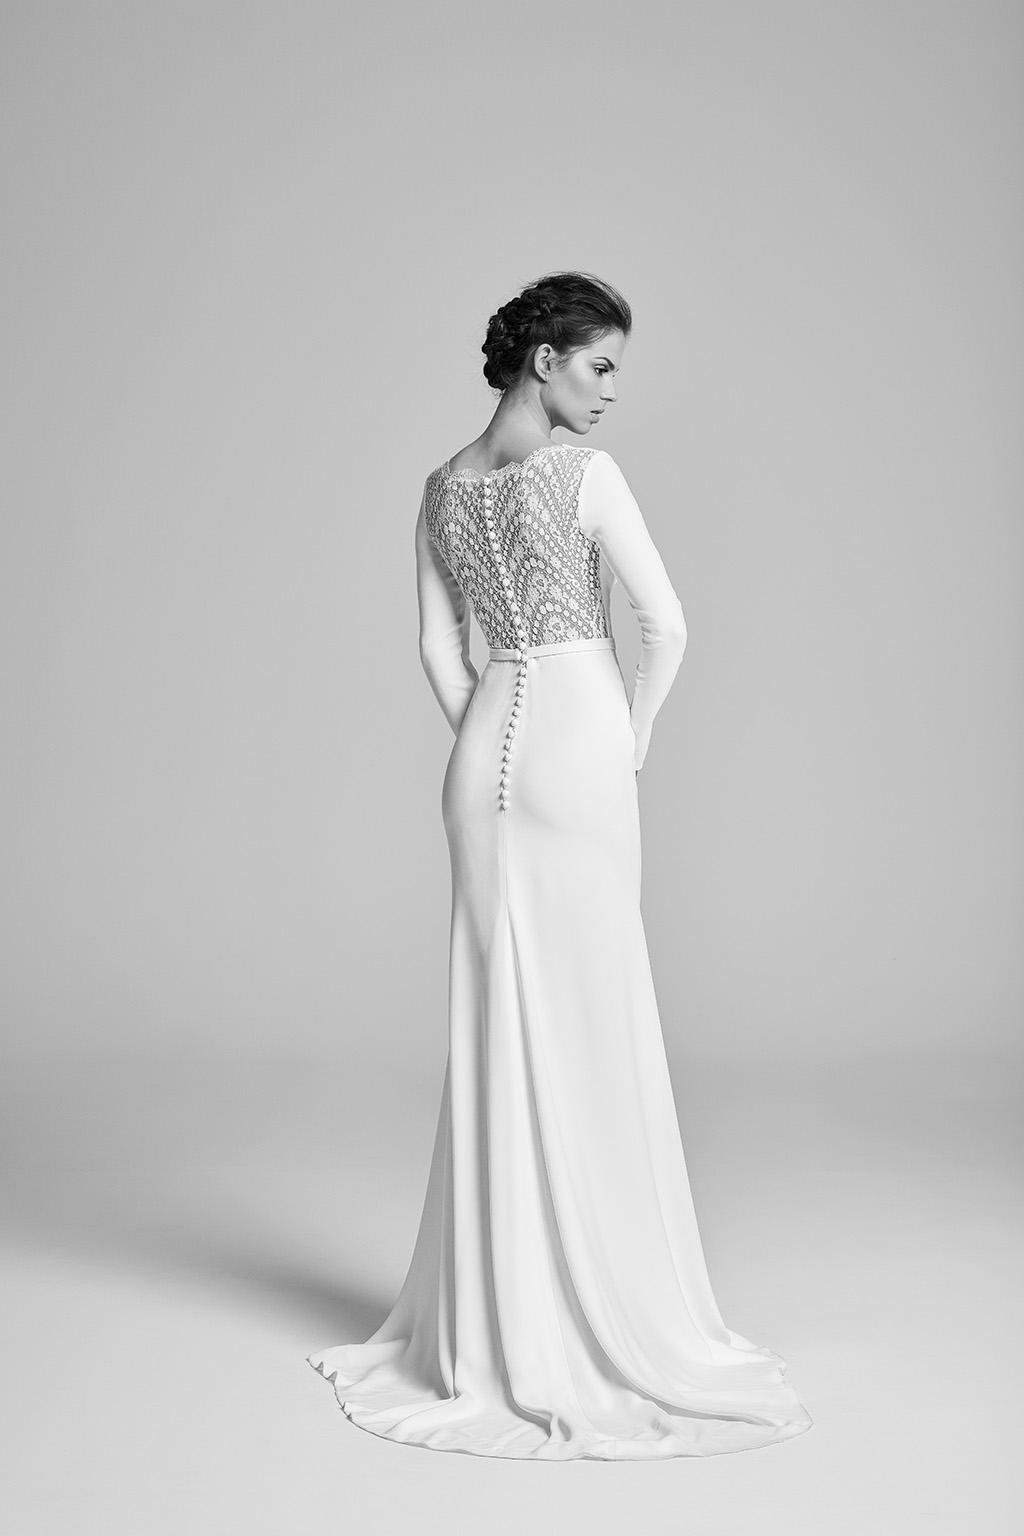 geddess-back-bridalcouture-wedding-dresses-uk-belle-epoque-collection-2018-by-designer-suzanne-neville